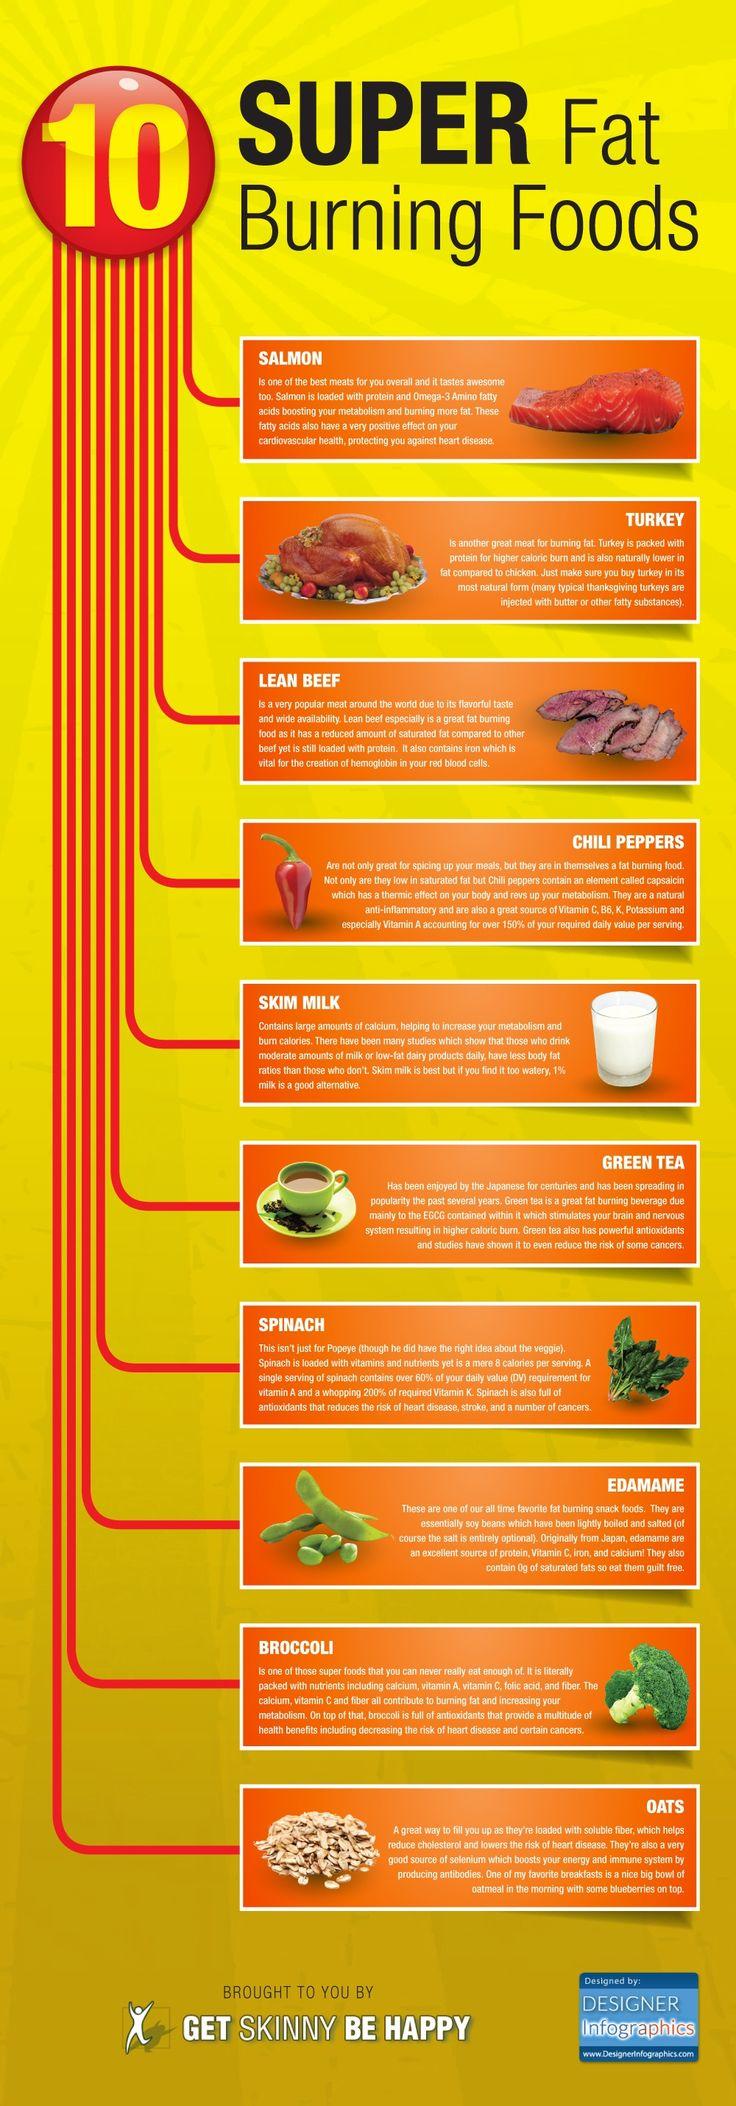 10 Super FatBurning Foods Infographic